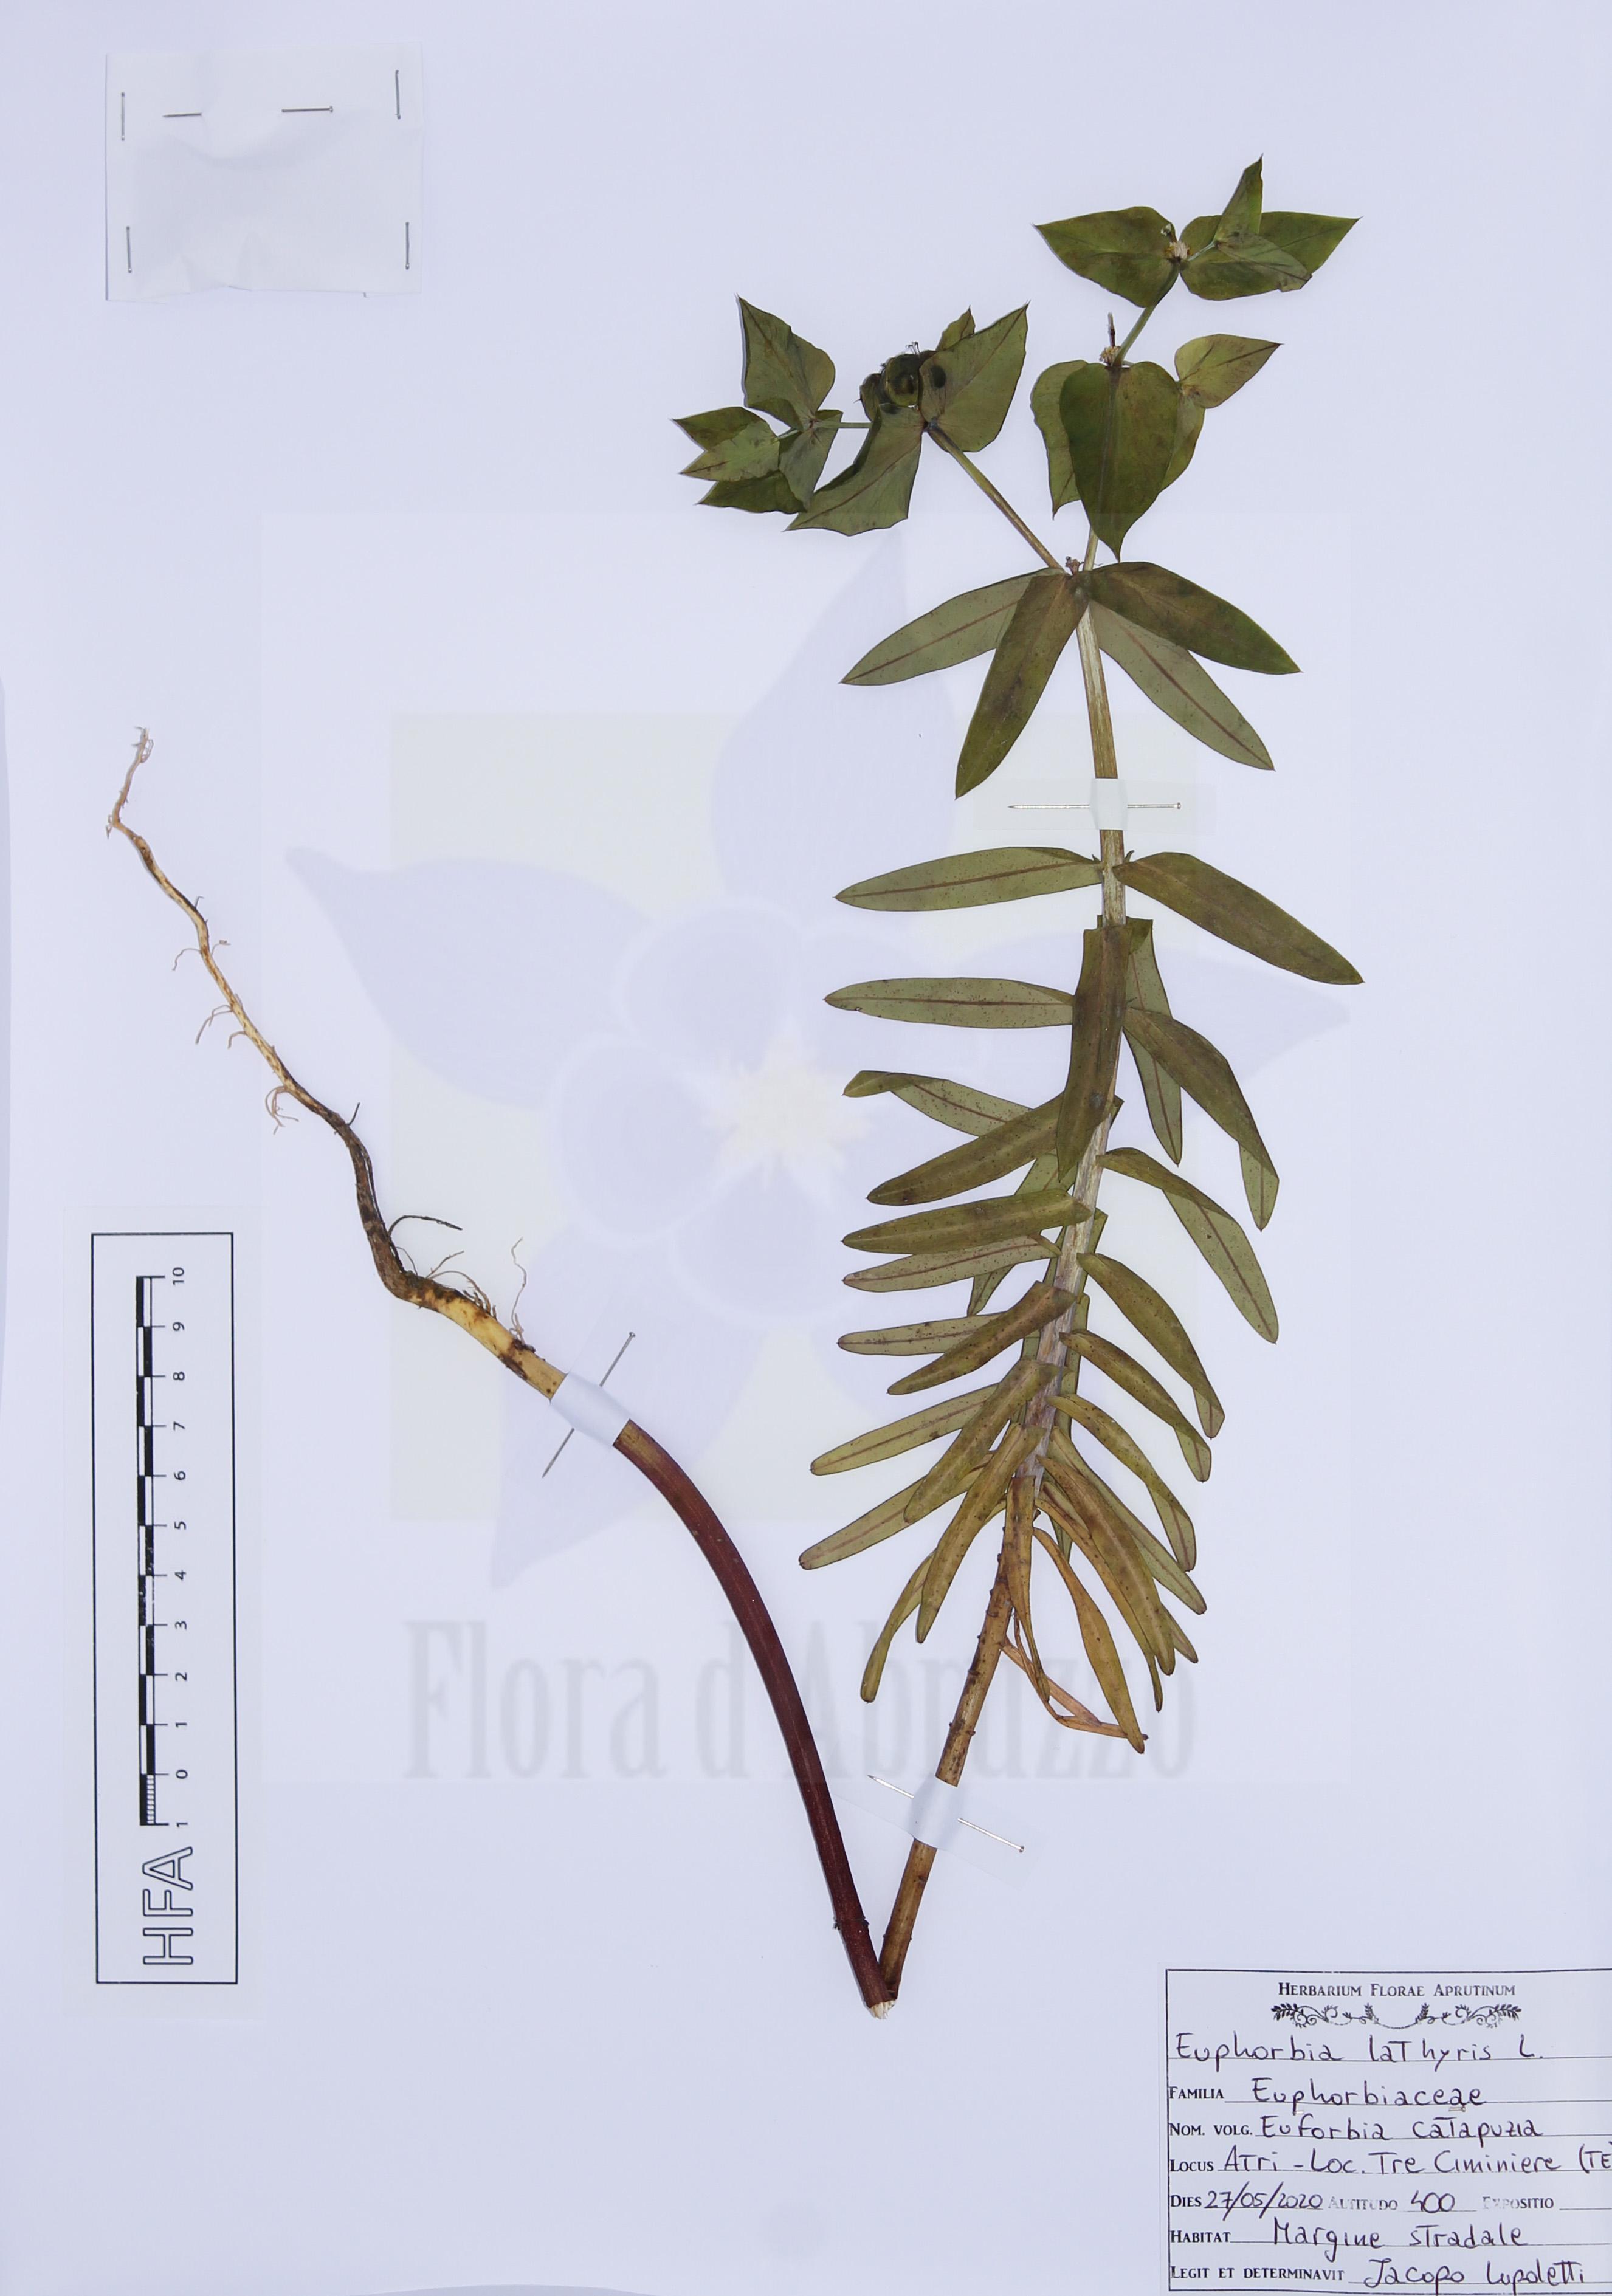 Euphorbia lathyrisL.